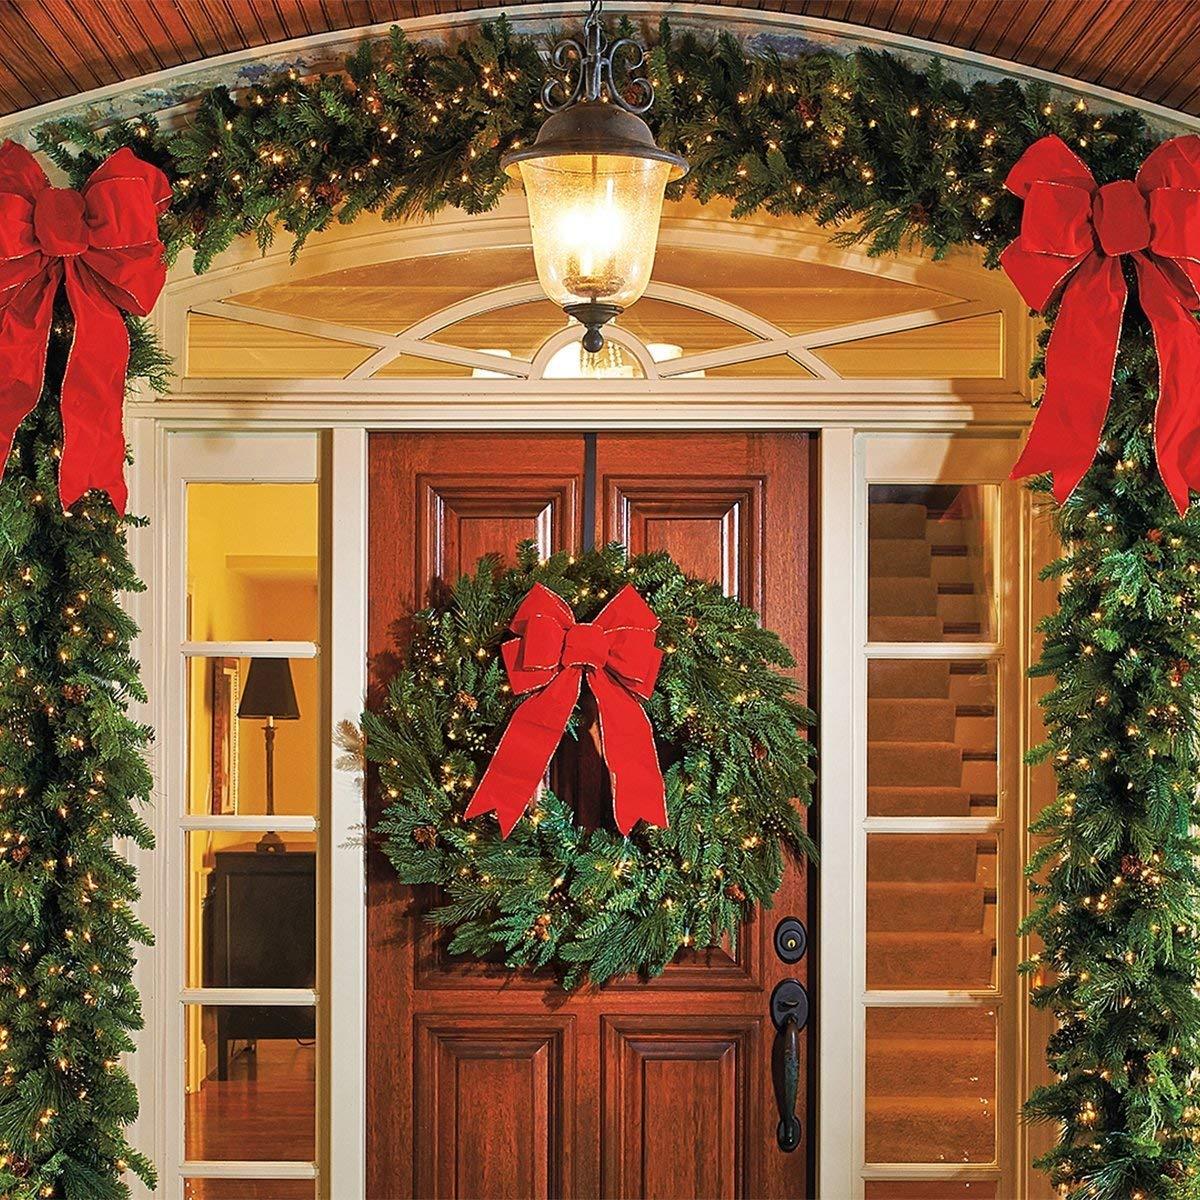 HOMEMAXS Metal Wreath Hanger Over The Door Wreath Holder 4 Packs 13.8inch Larger Wreath Metal Hook for Christmas (Black) by HOMEMAXS (Image #5)